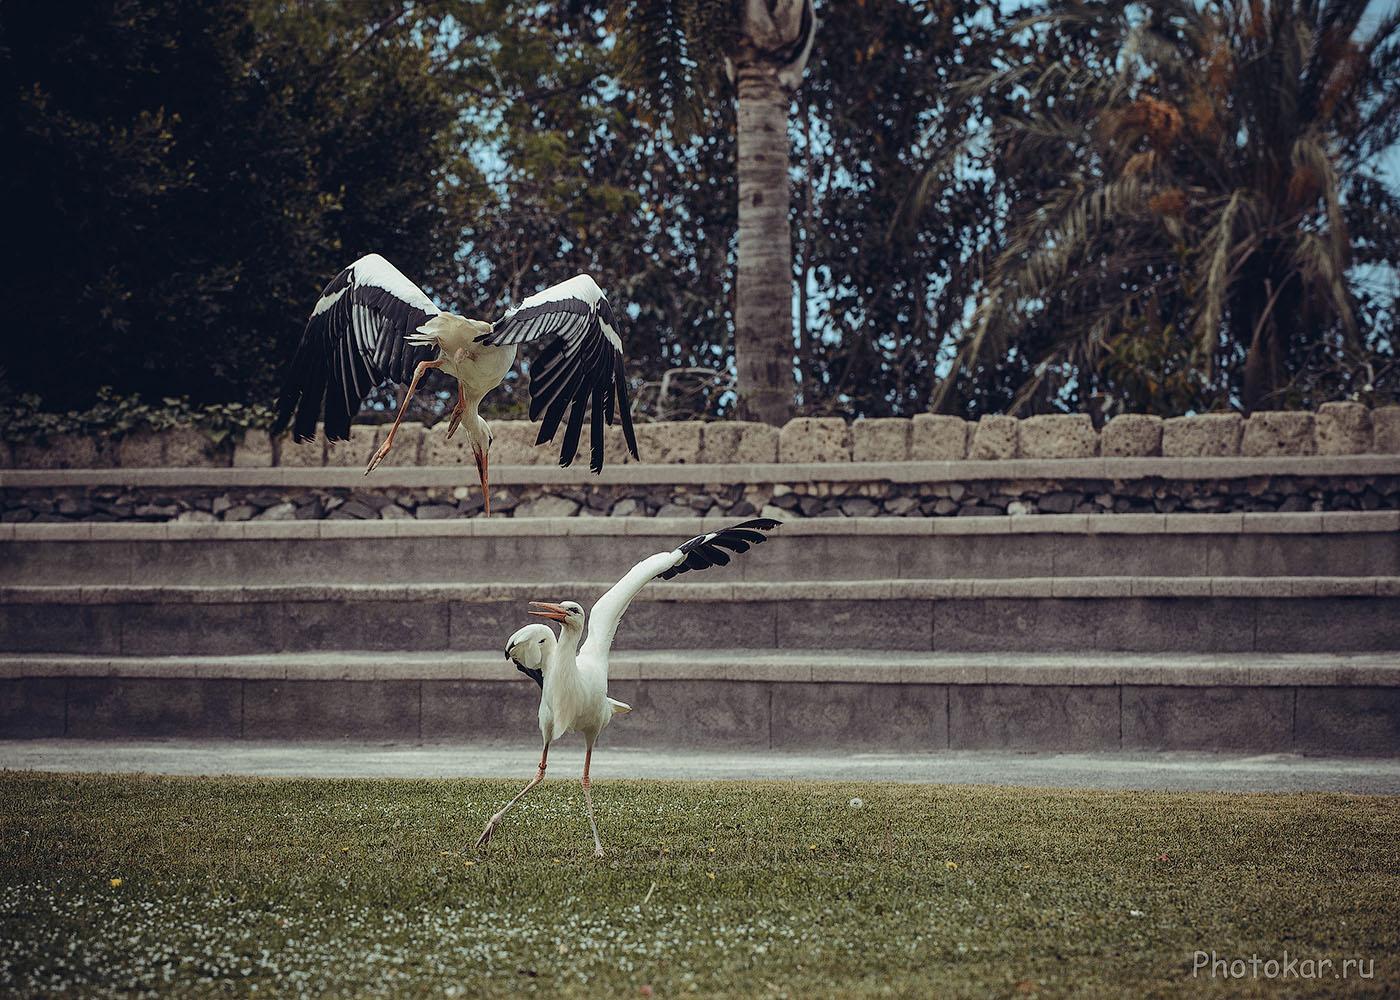 Фотография 18. Танцы аистов, снятые на телеобъектив Nikon 70-200mm f/4 (1/1000, +0.33, f/6.3, 400, 135)